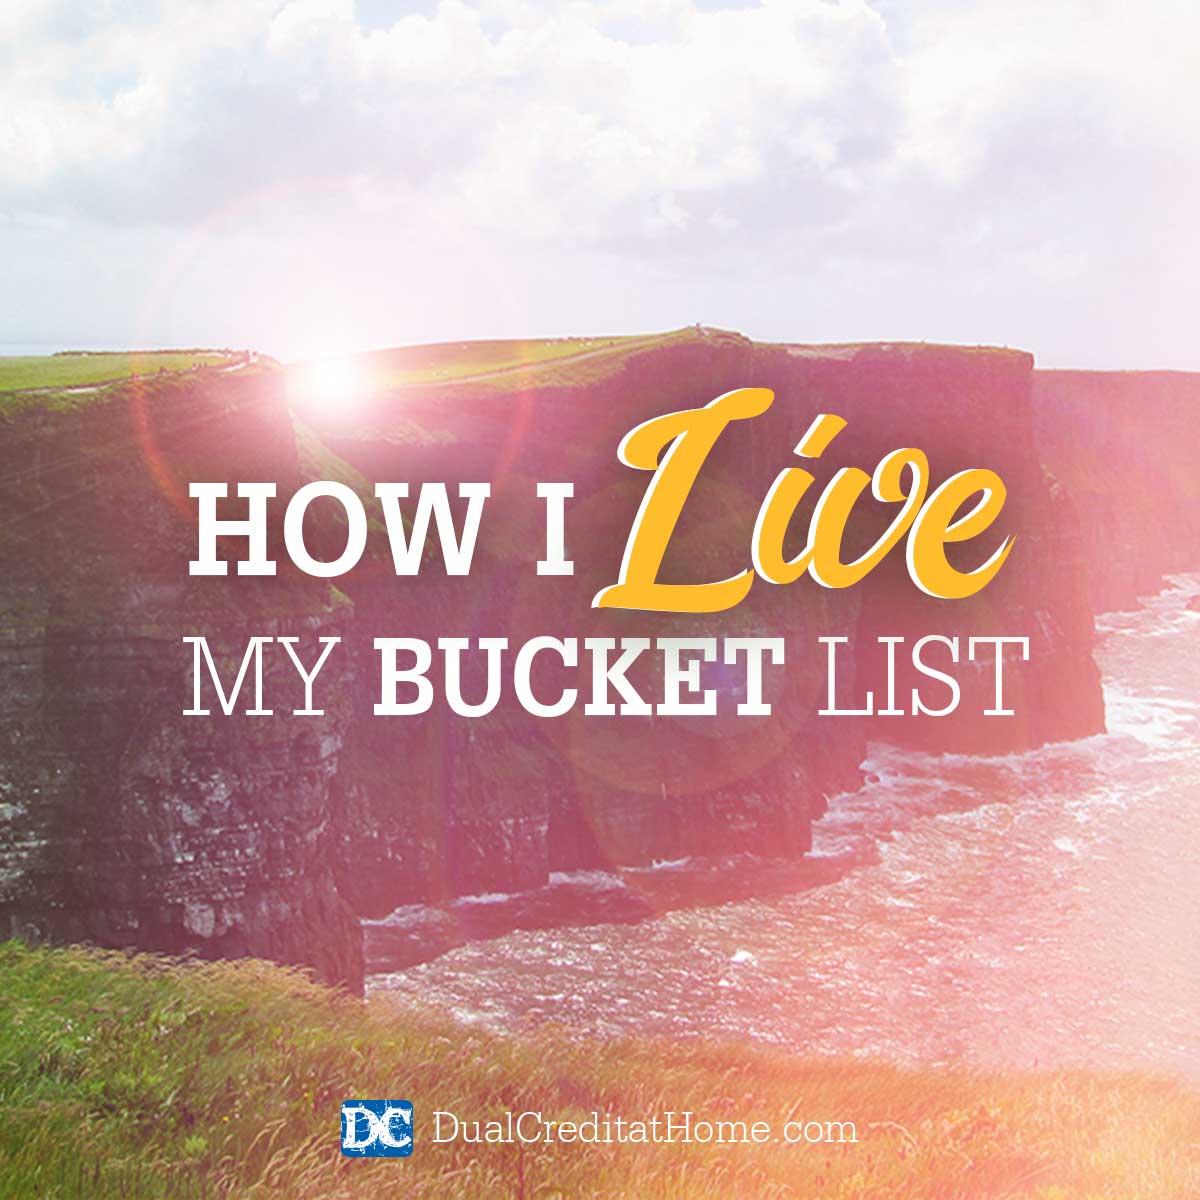 How I Live My Bucket List